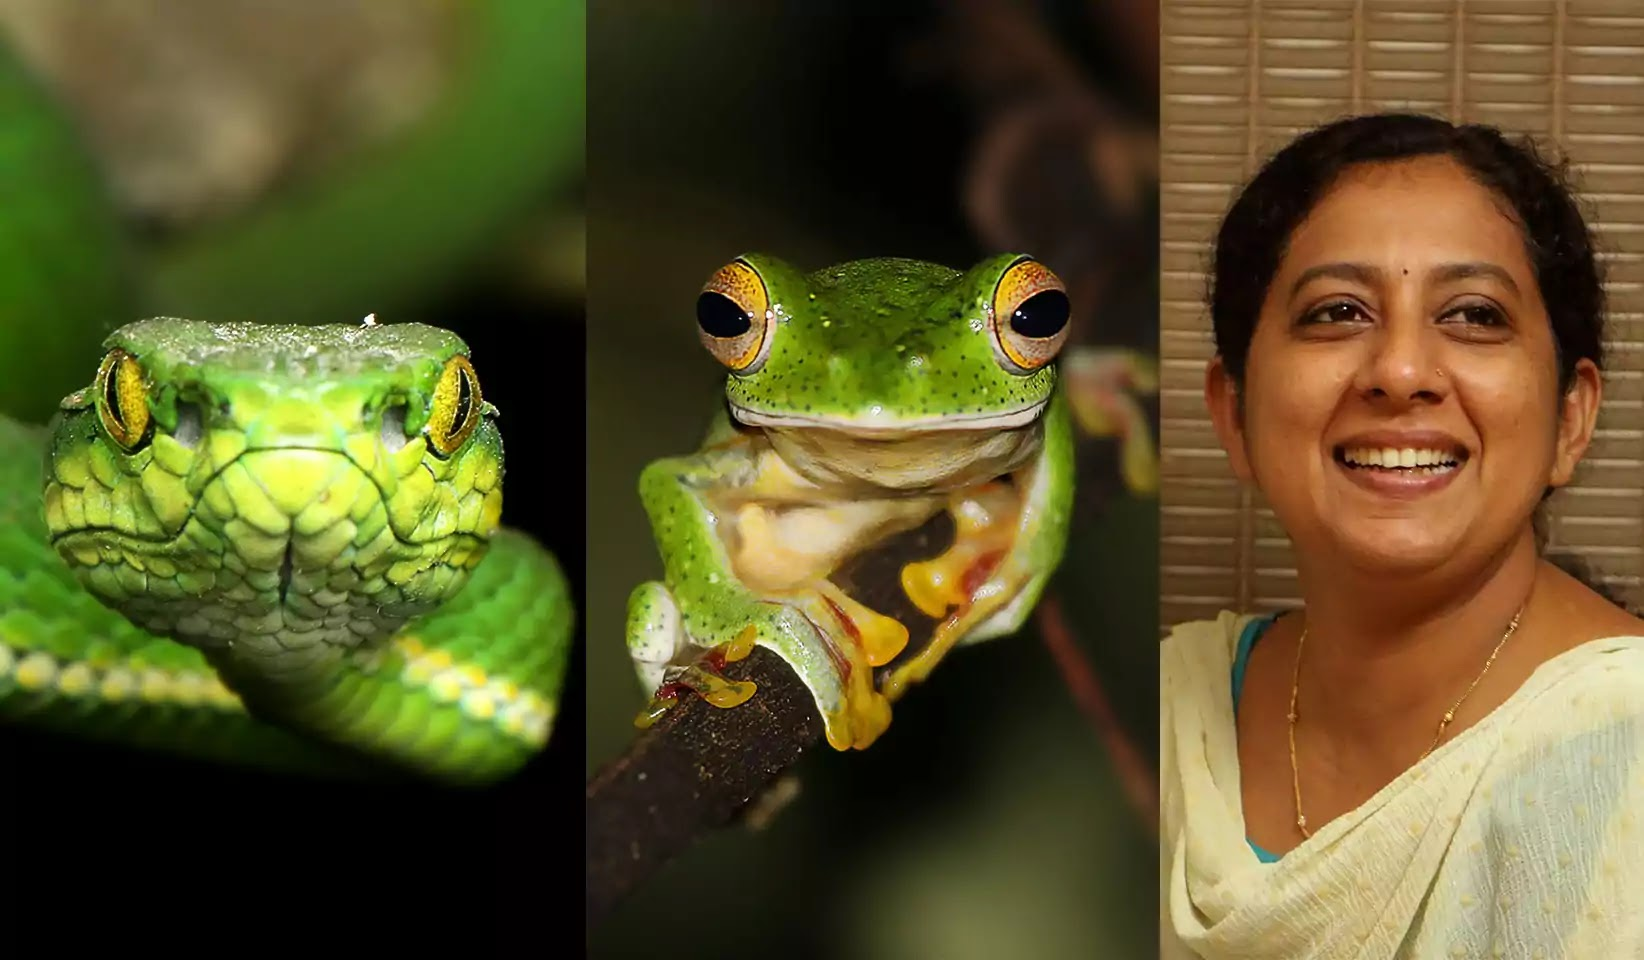 Green snake, frog, Shalini binnu